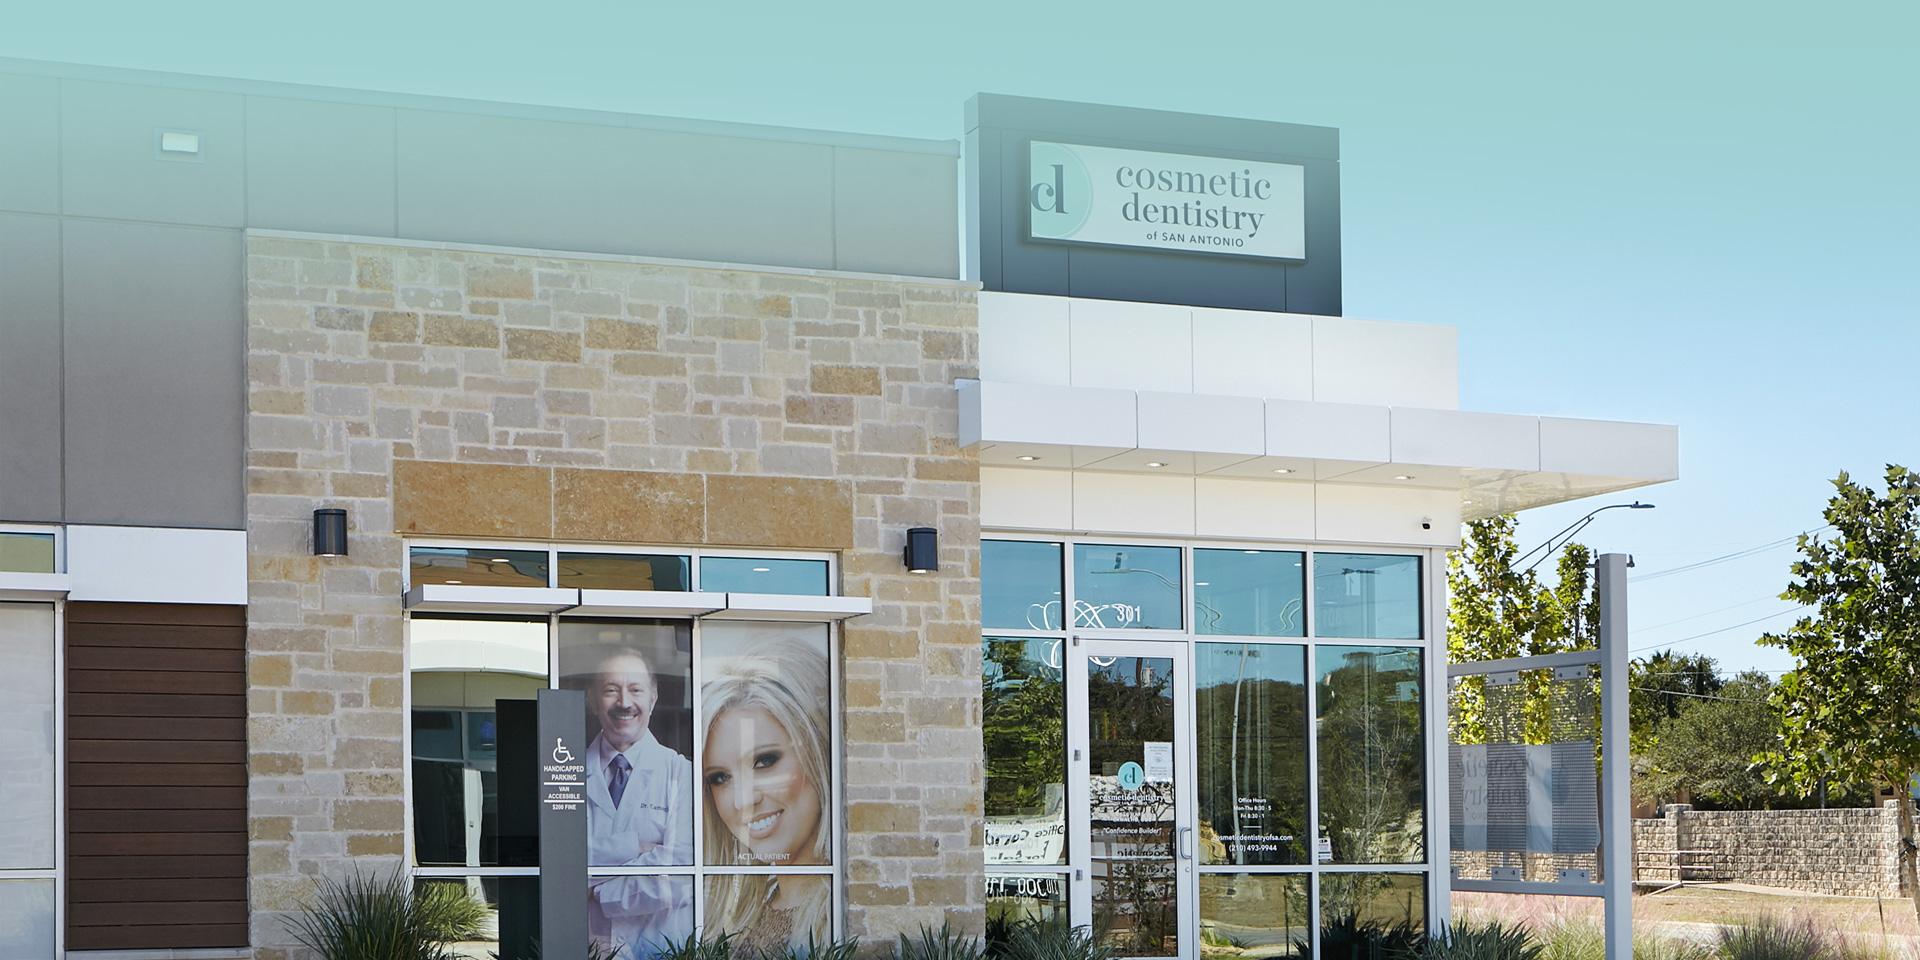 Office of Cosmetic Dentistry of San Antonio